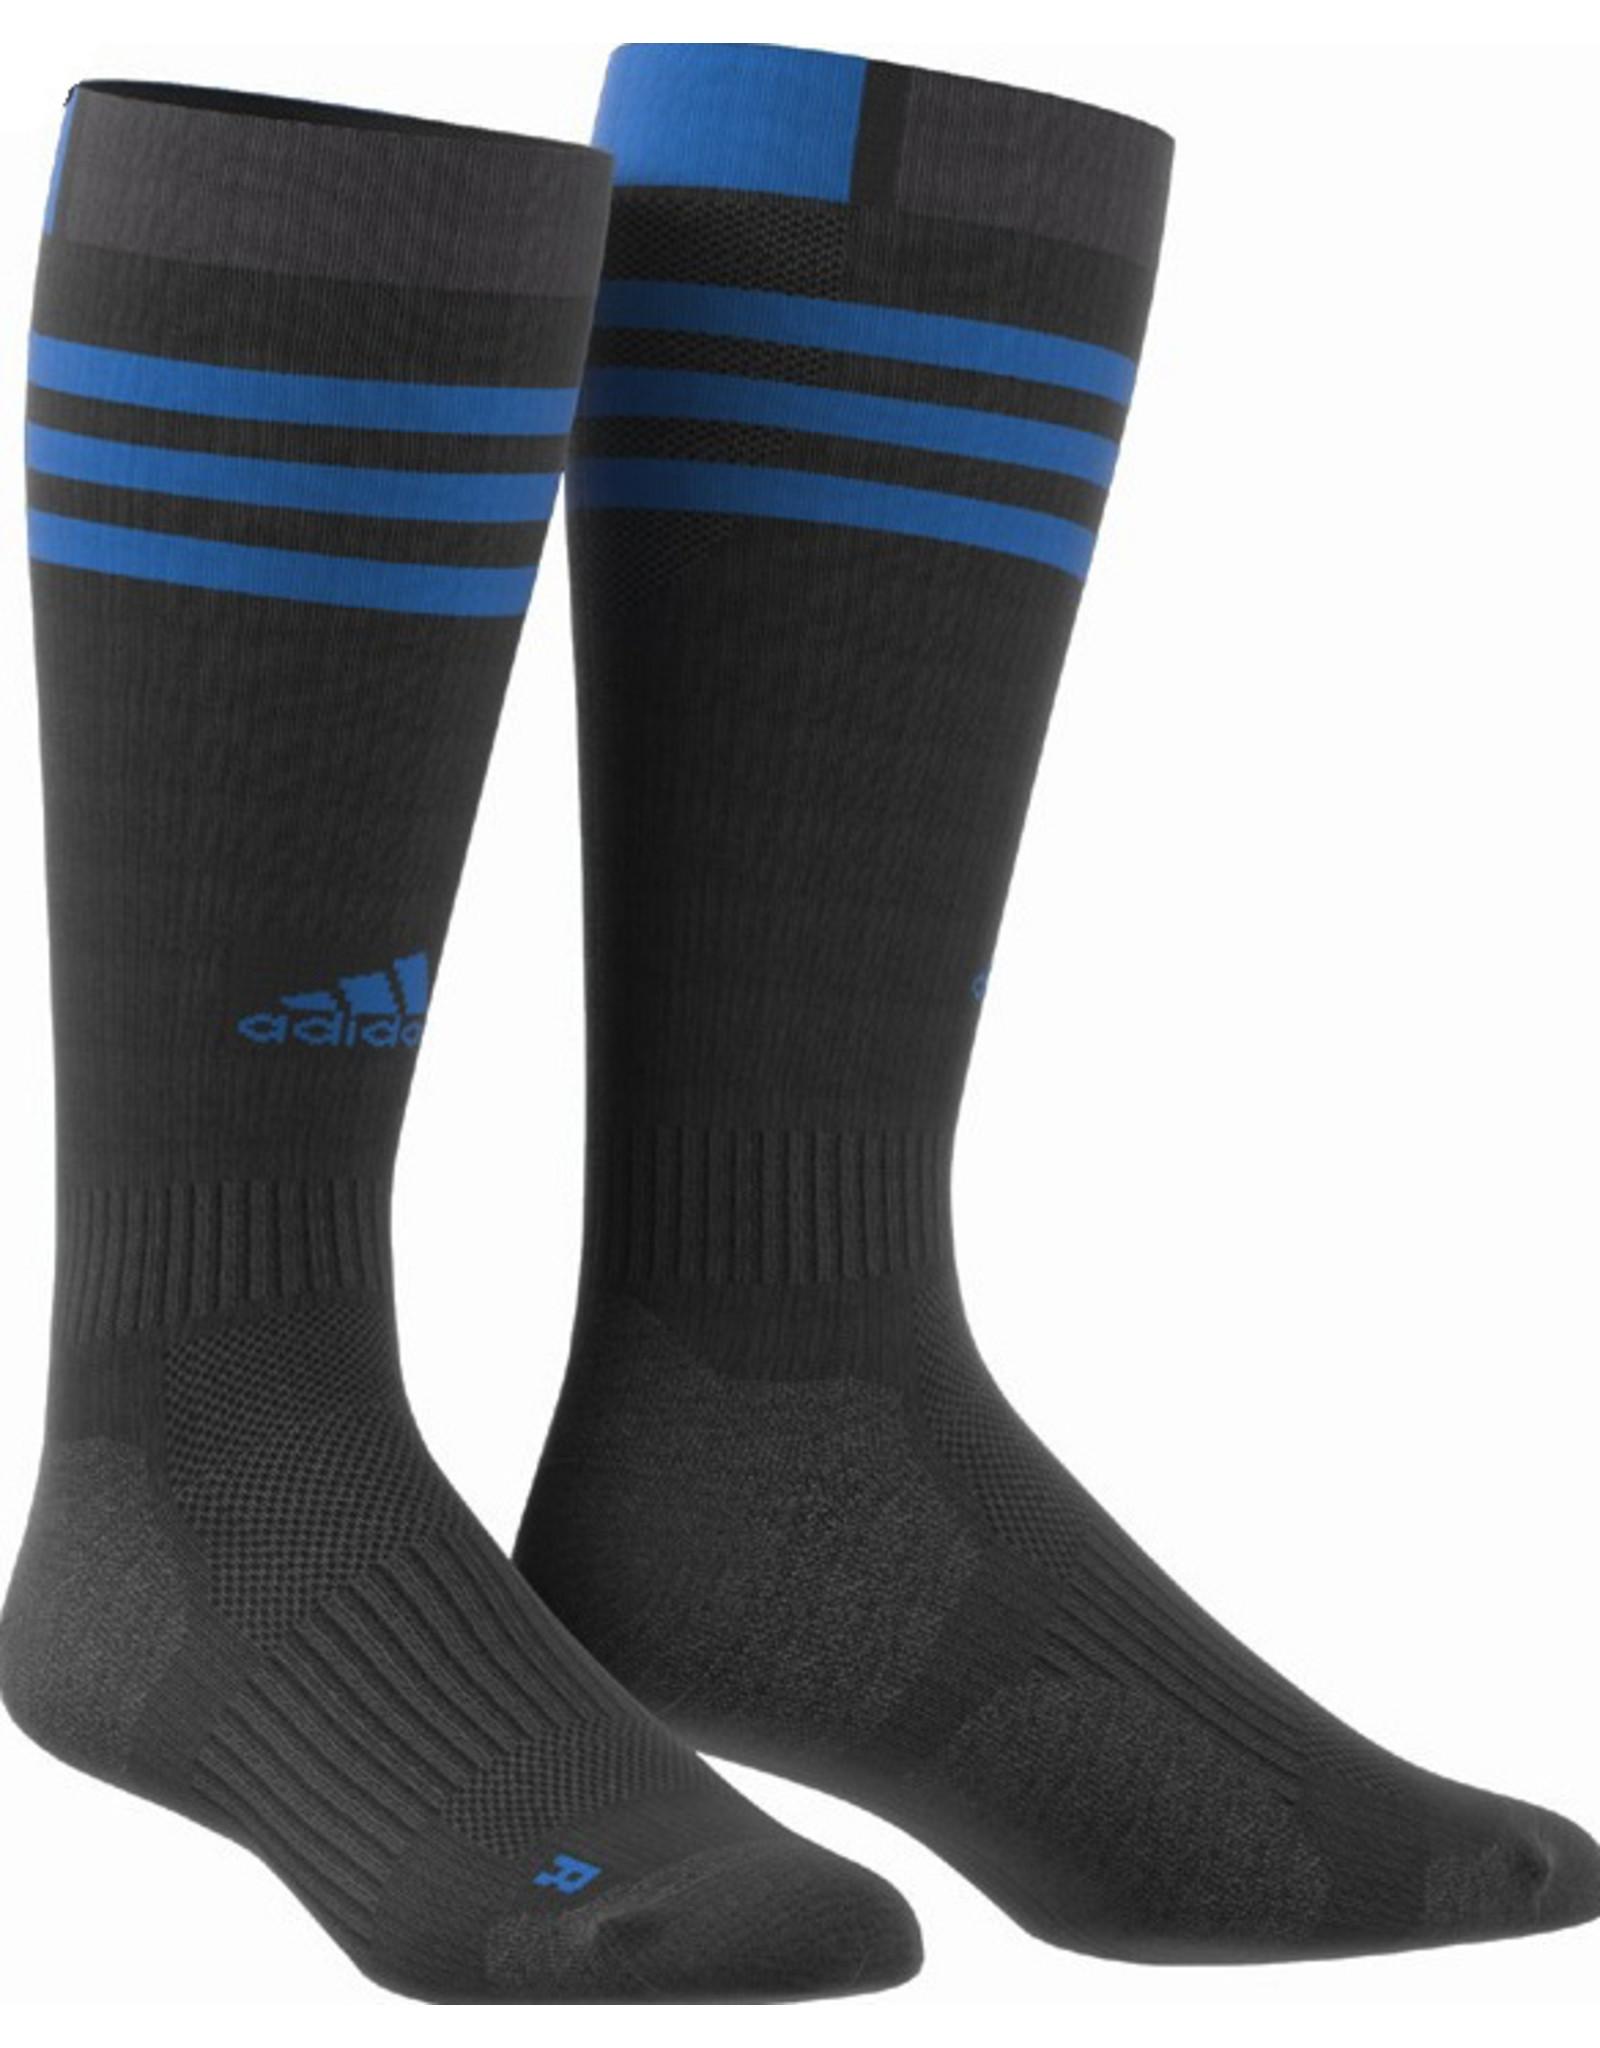 Adidas ID Sock Black